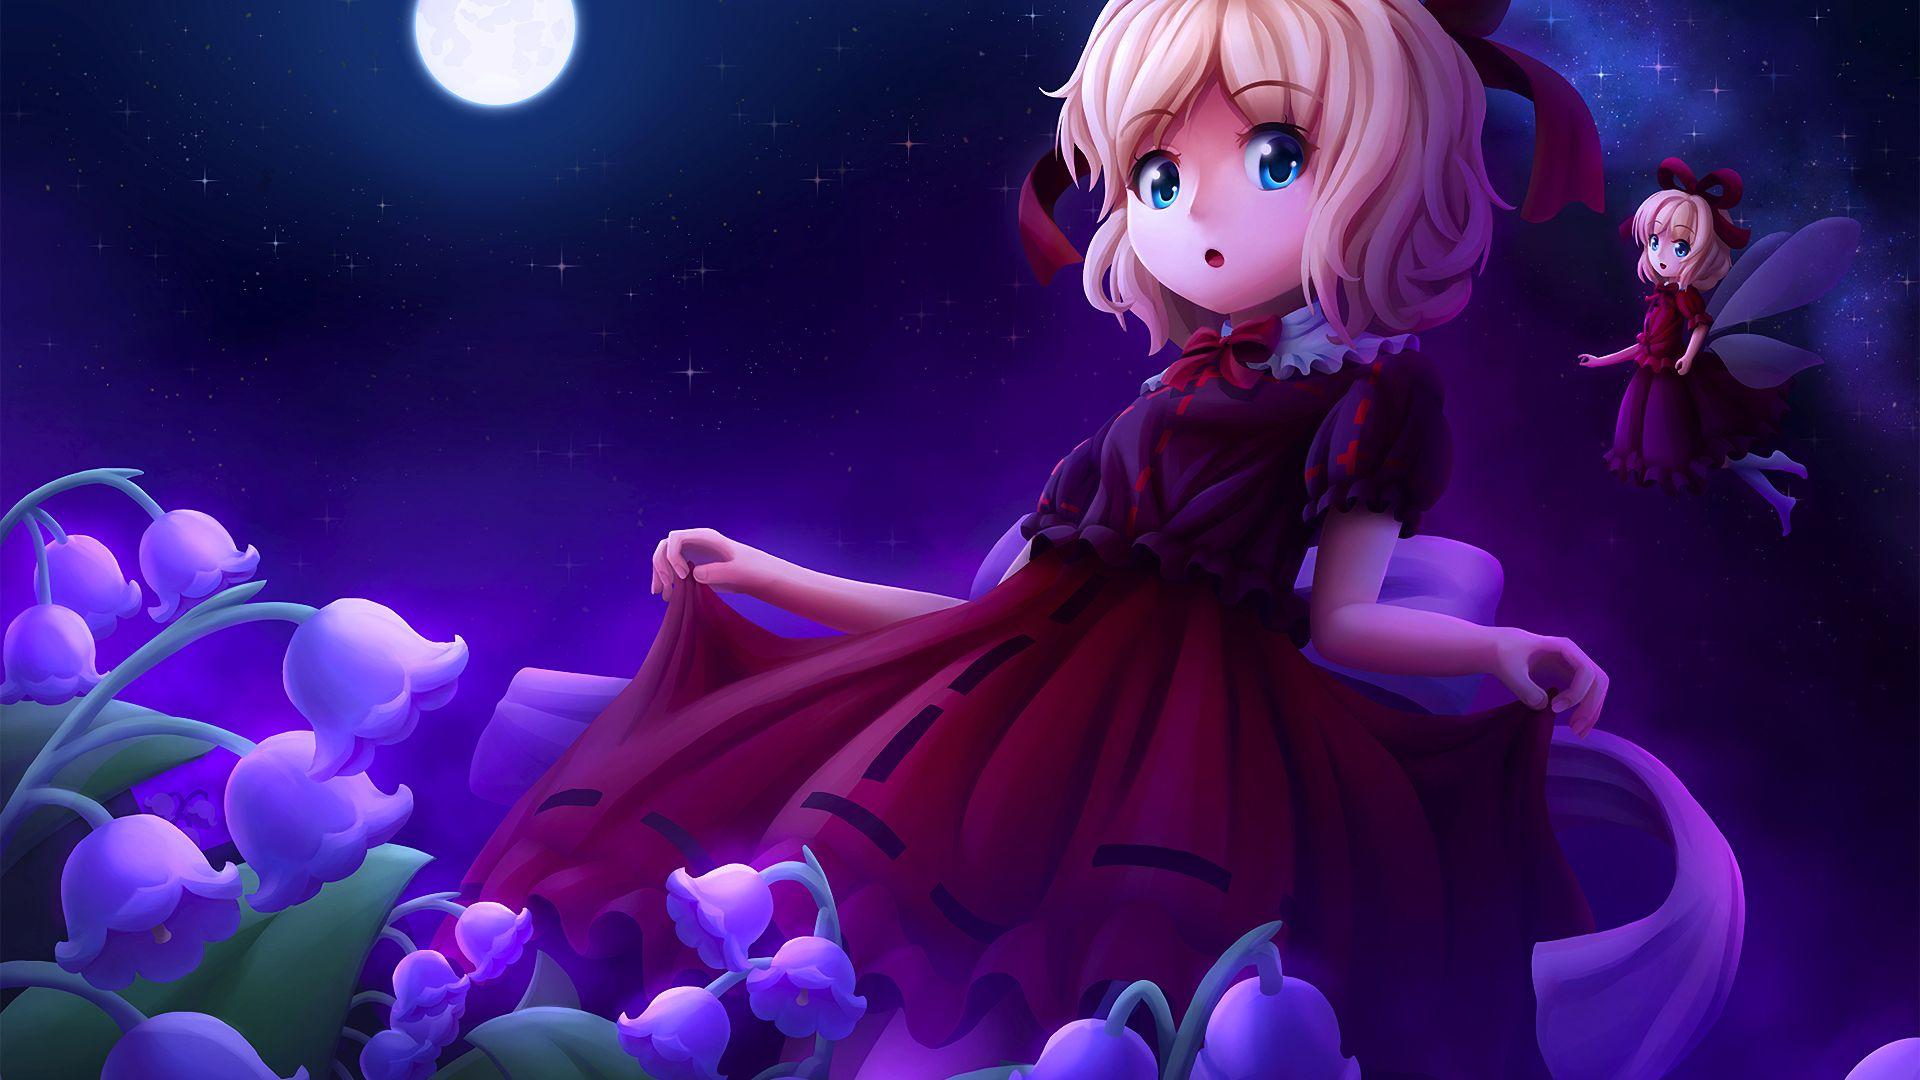 Wallpaper Cute anime girl, Medicine Melancholy, Touhou, night